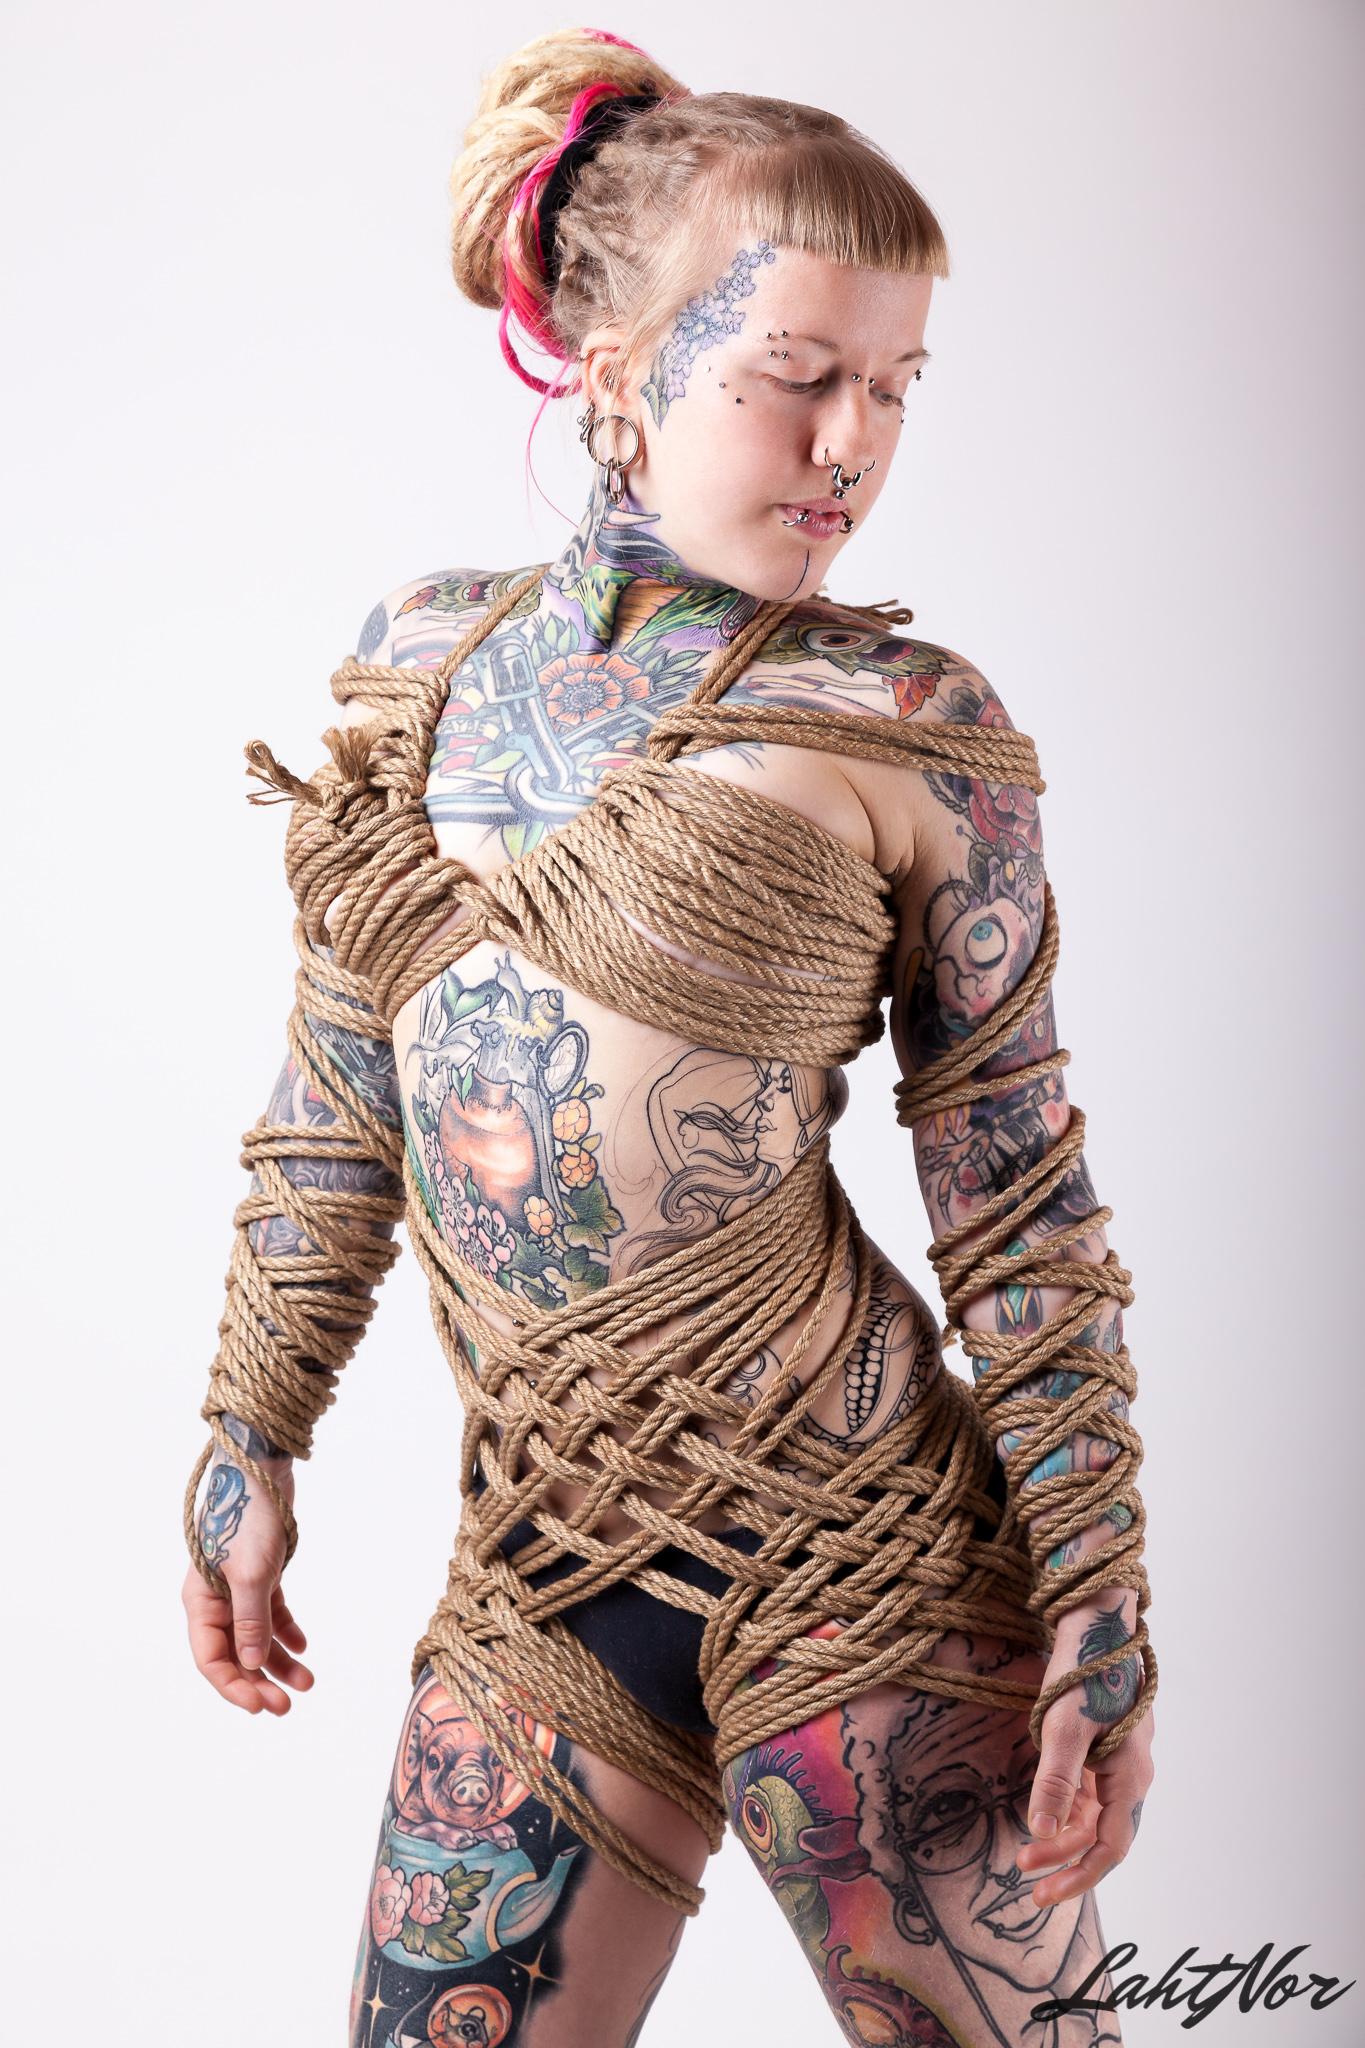 Tattoo Armour